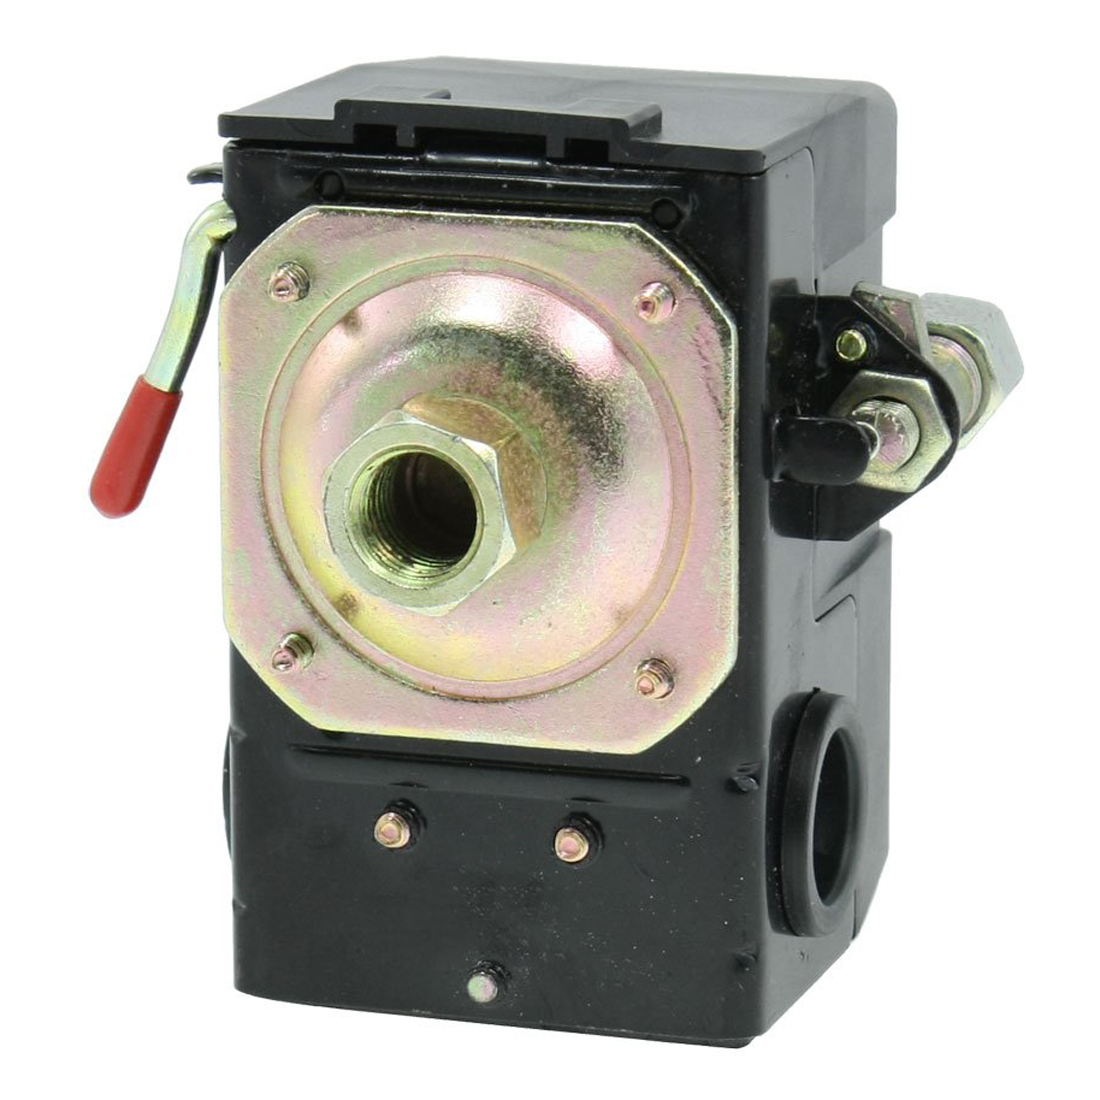 AYHF-80-115PSI 1/4 NPT 1-Port Air Compressor Pressure Switch Control Valve free shipping high quality 1 pcs heavy duty air compressor pressure switch control valve 220vac 90 psi 120 psi dropshipping